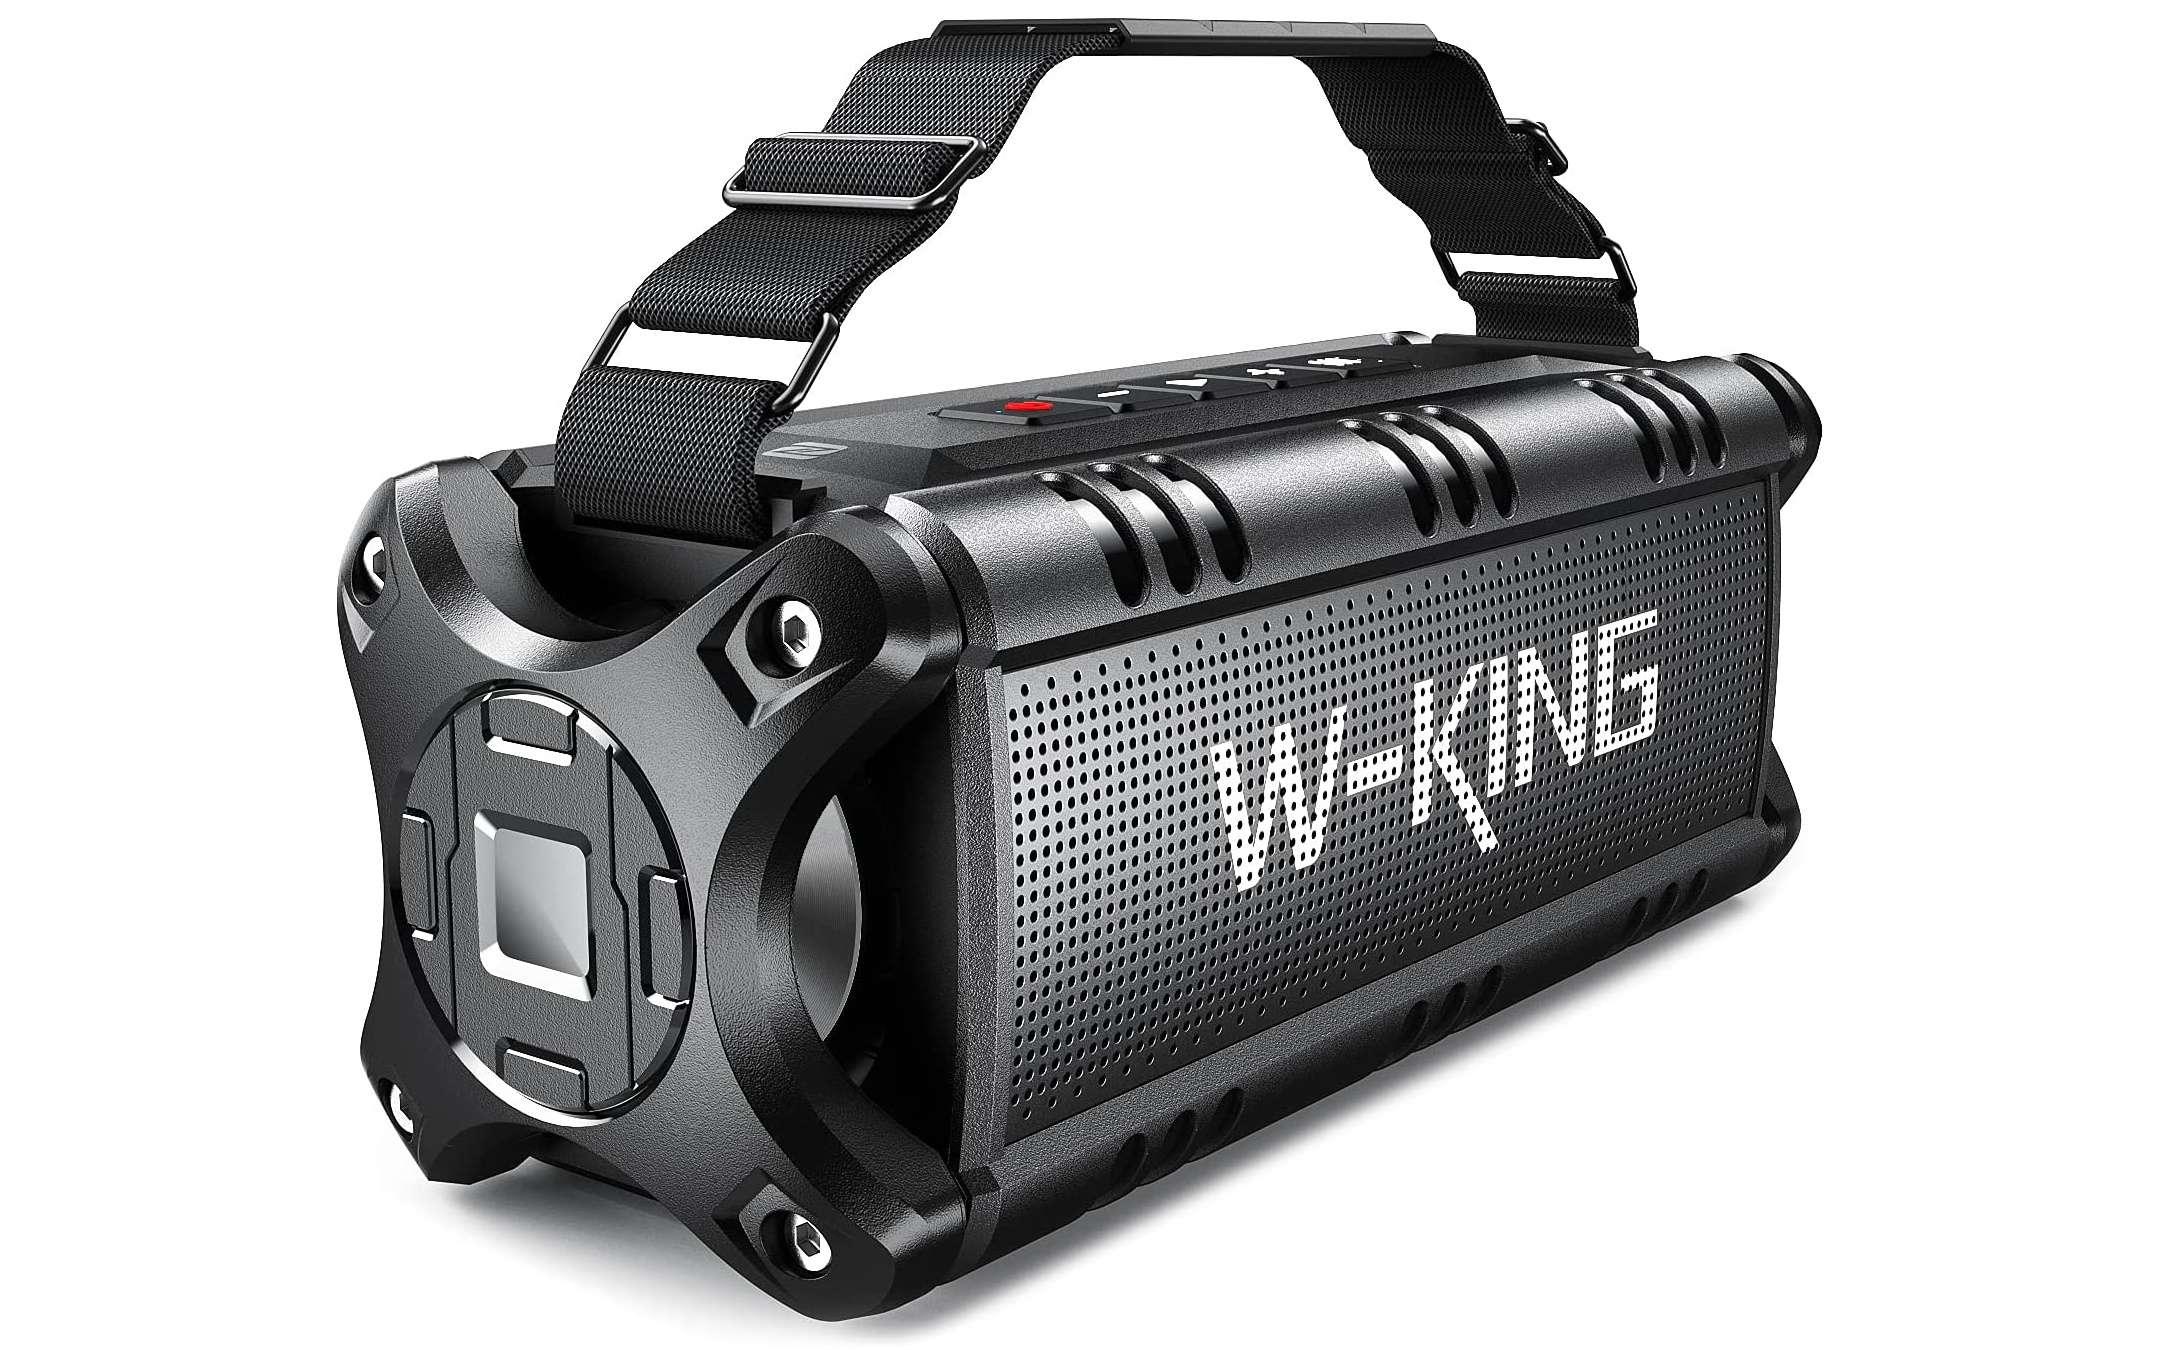 Altoparlante Bluetooth Portatile W-King 50W - 2